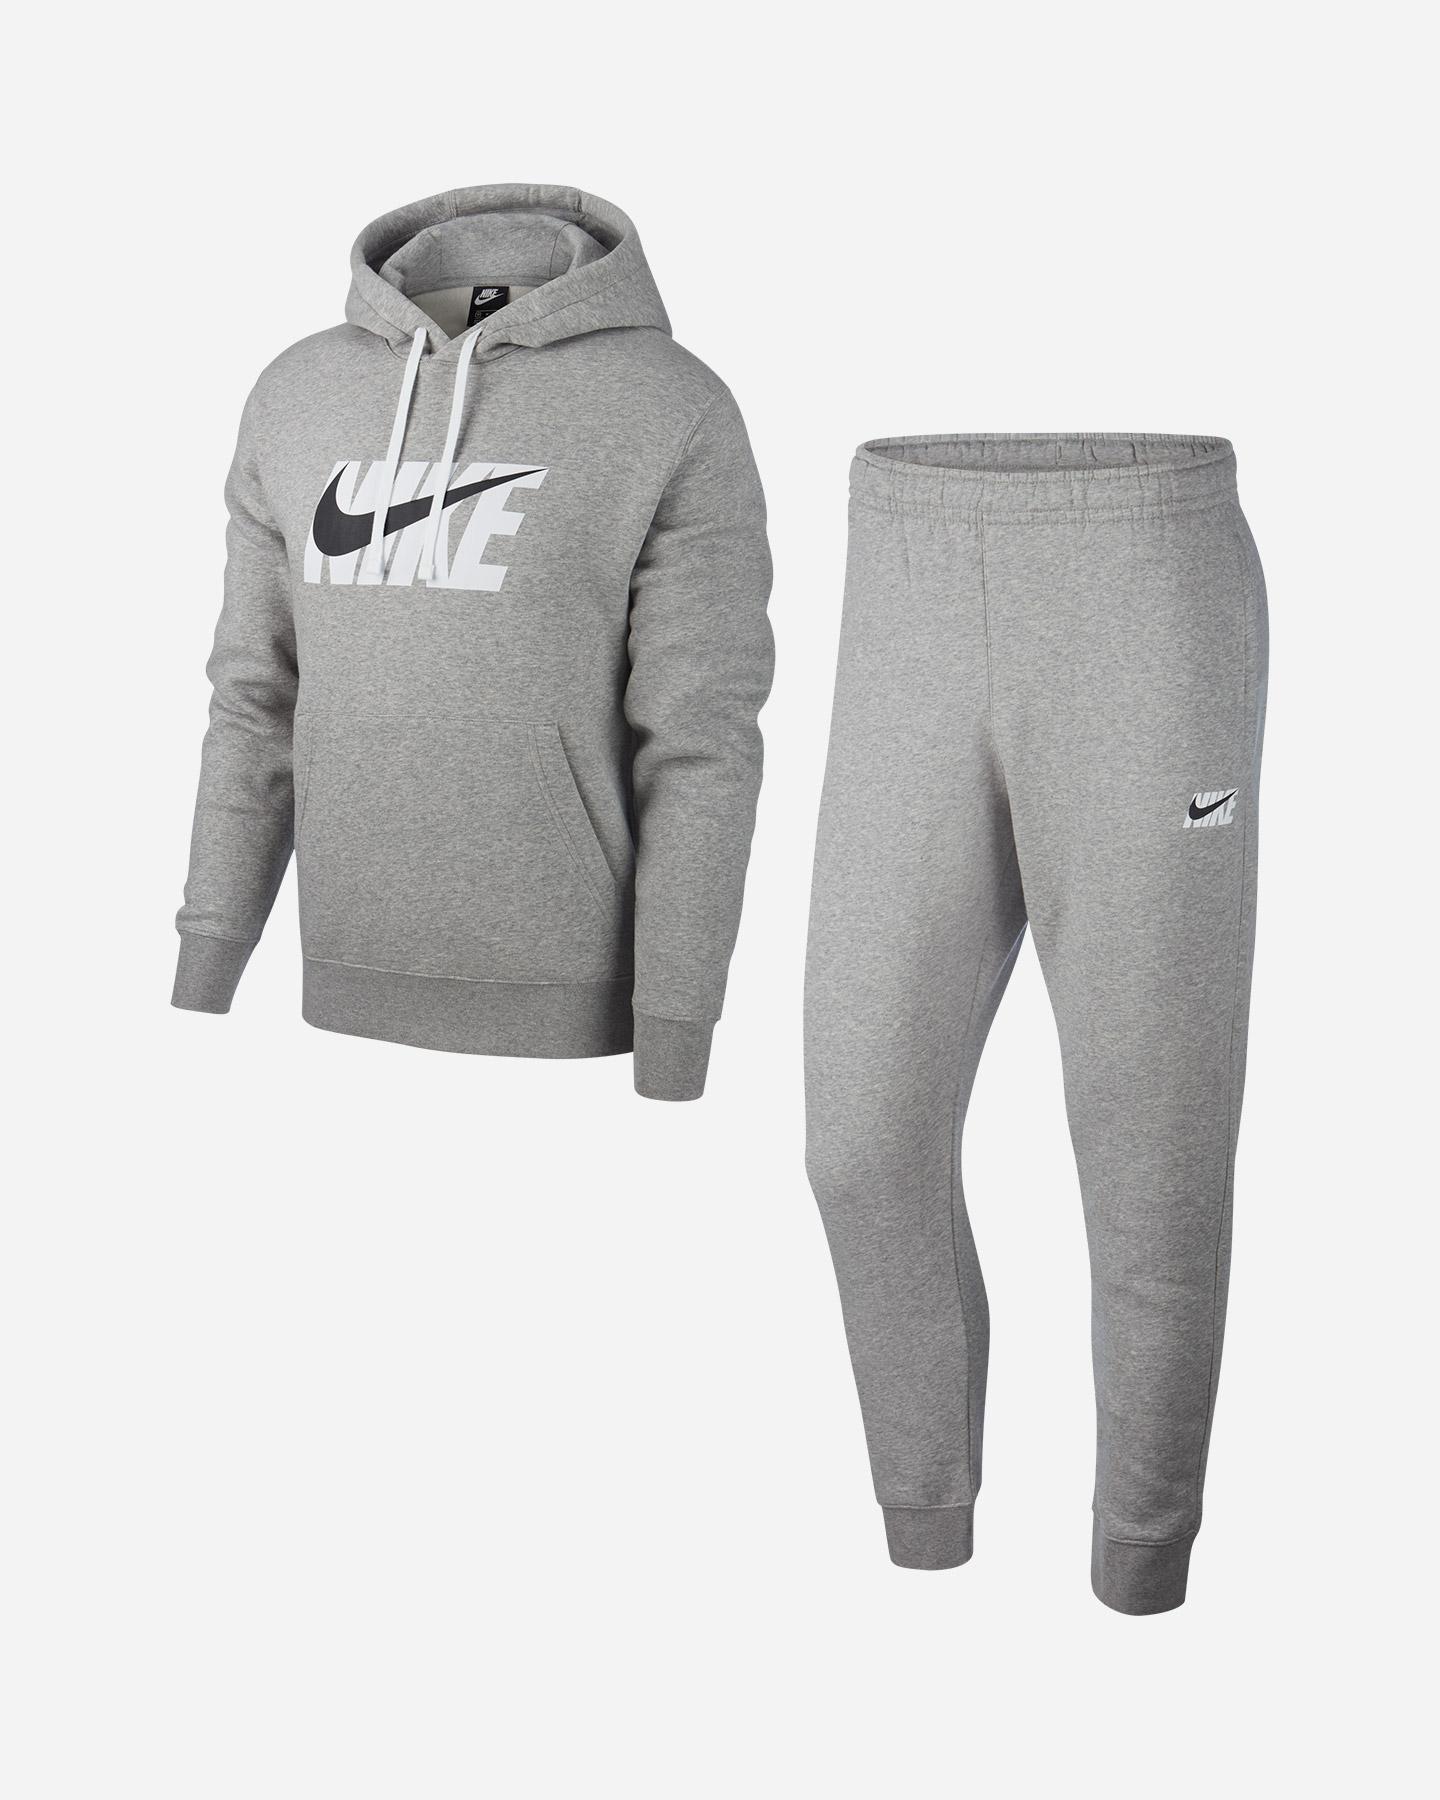 Tute Nike donna Cisalfa Sport